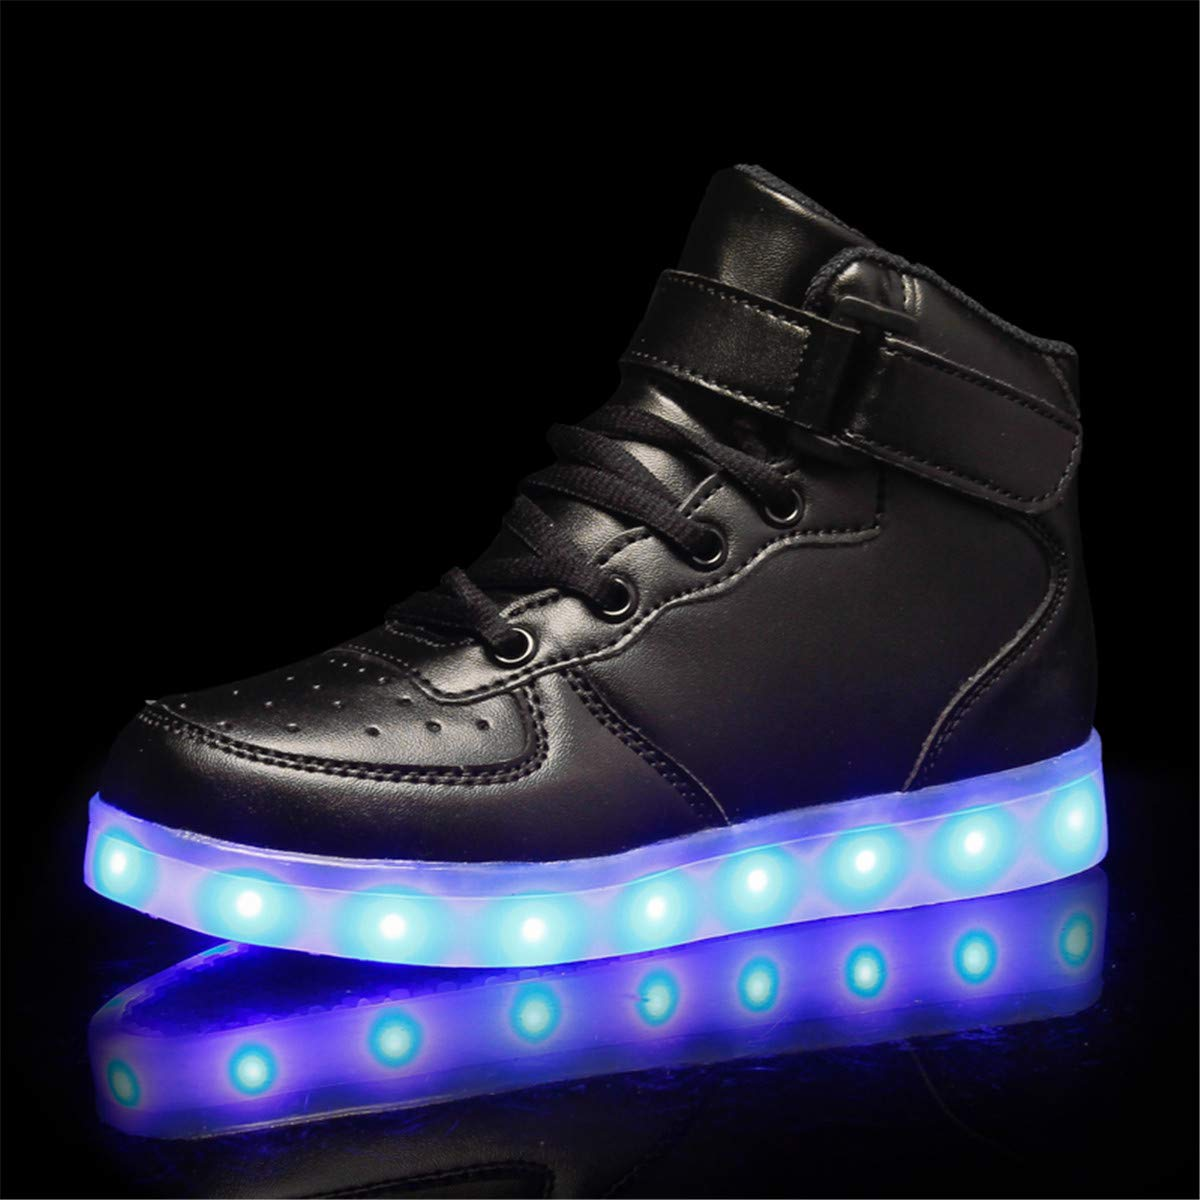 LED Chaussures Lumineuse Basket Mode Sneakers Enfants Flashing Trainers Running Brillant Antid/érapant 7 Couleurs USB Charge pour Unisexe Gar/çon Fille